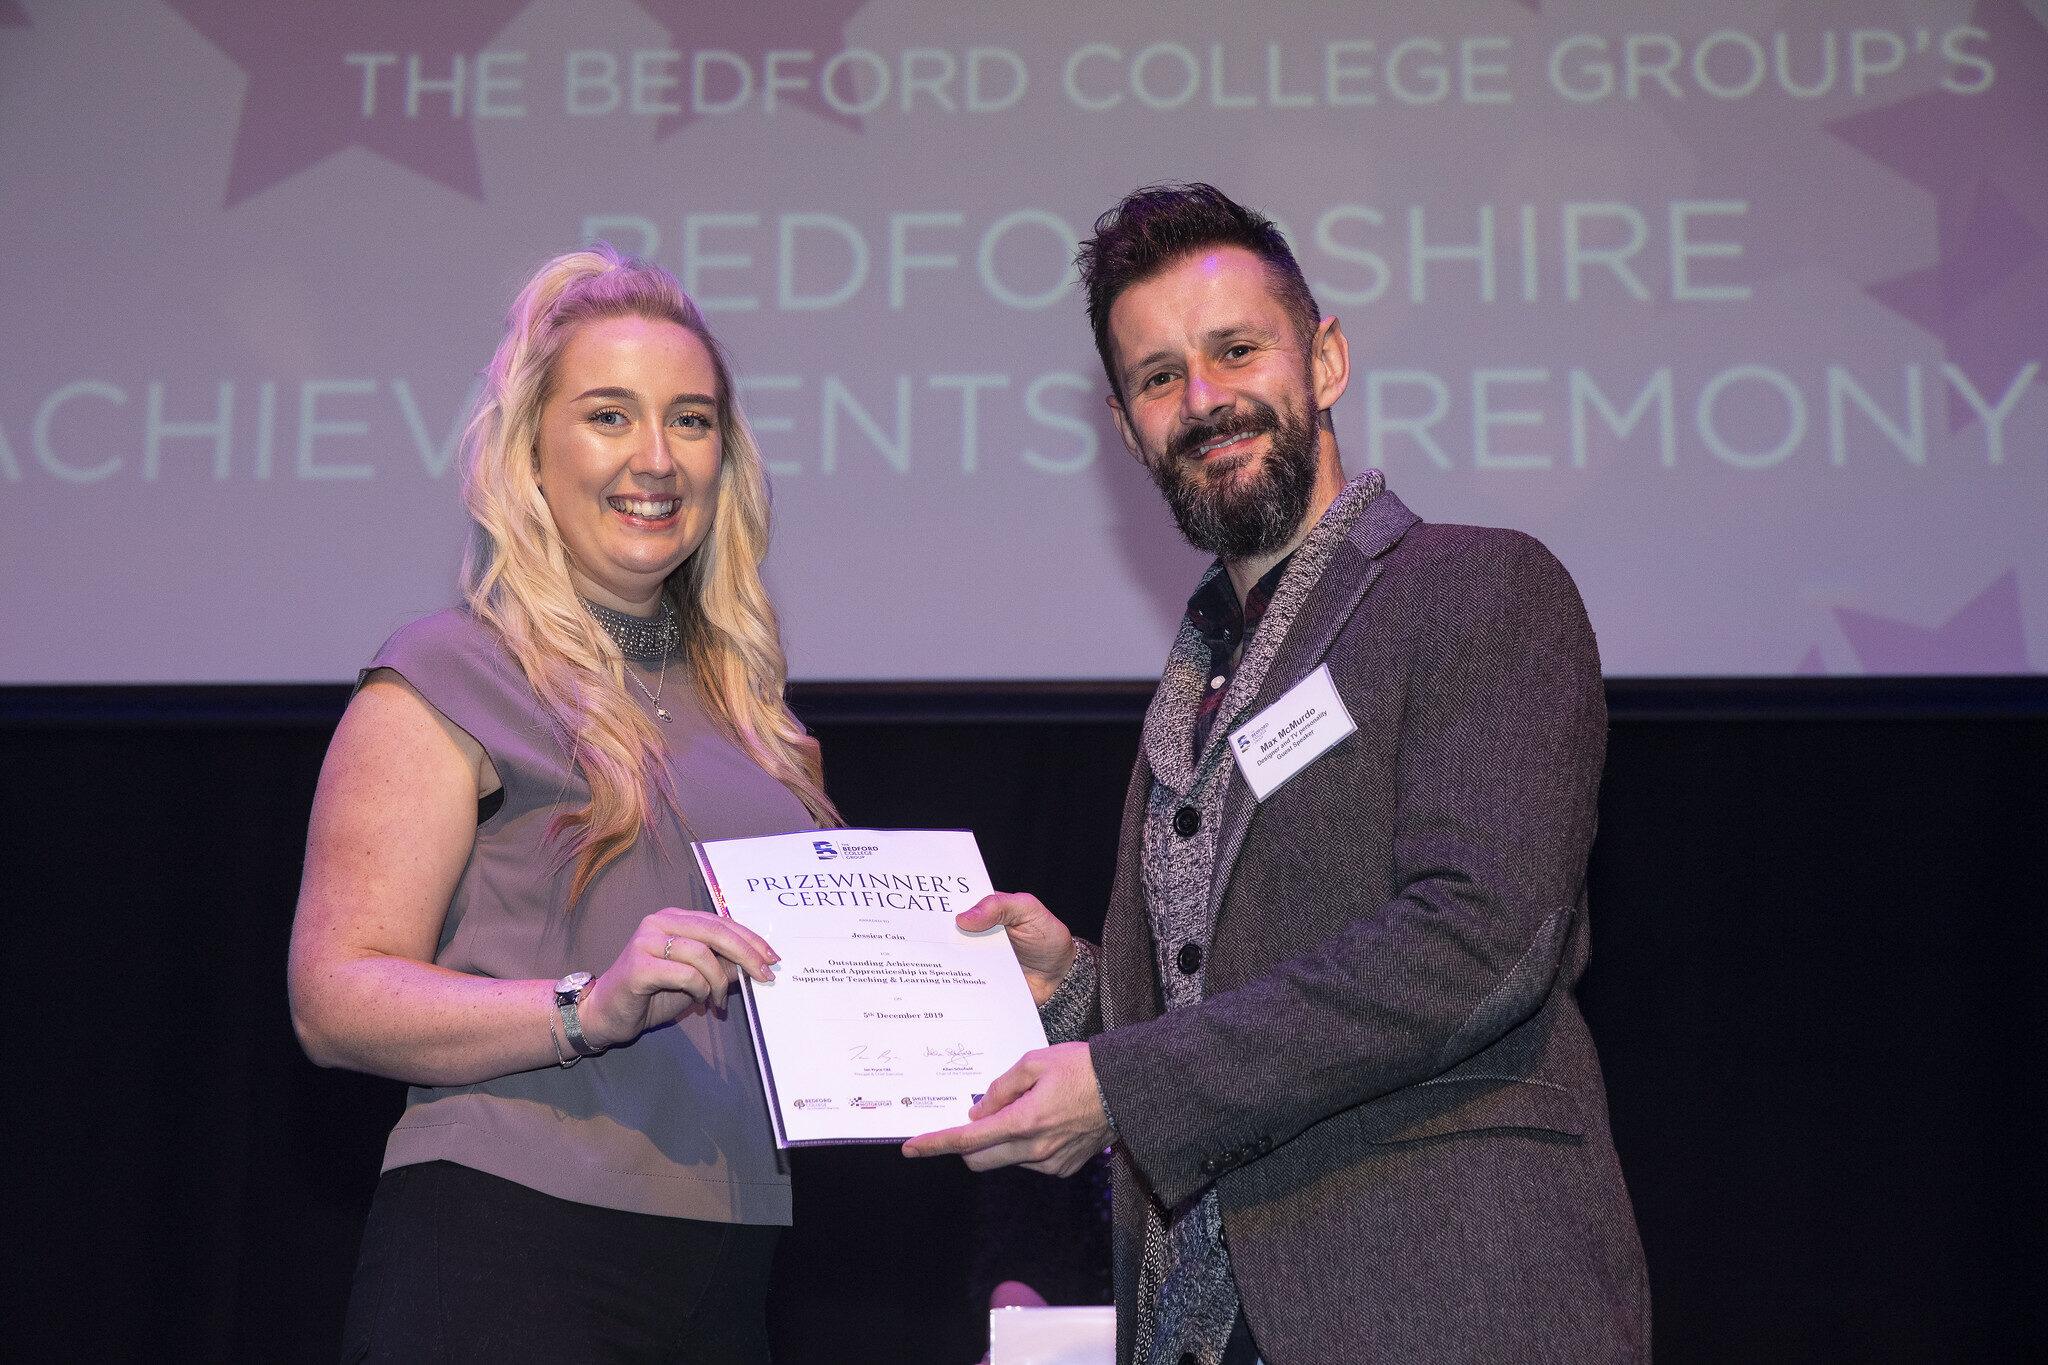 Bedfordshire Achievements Ceremony 2019